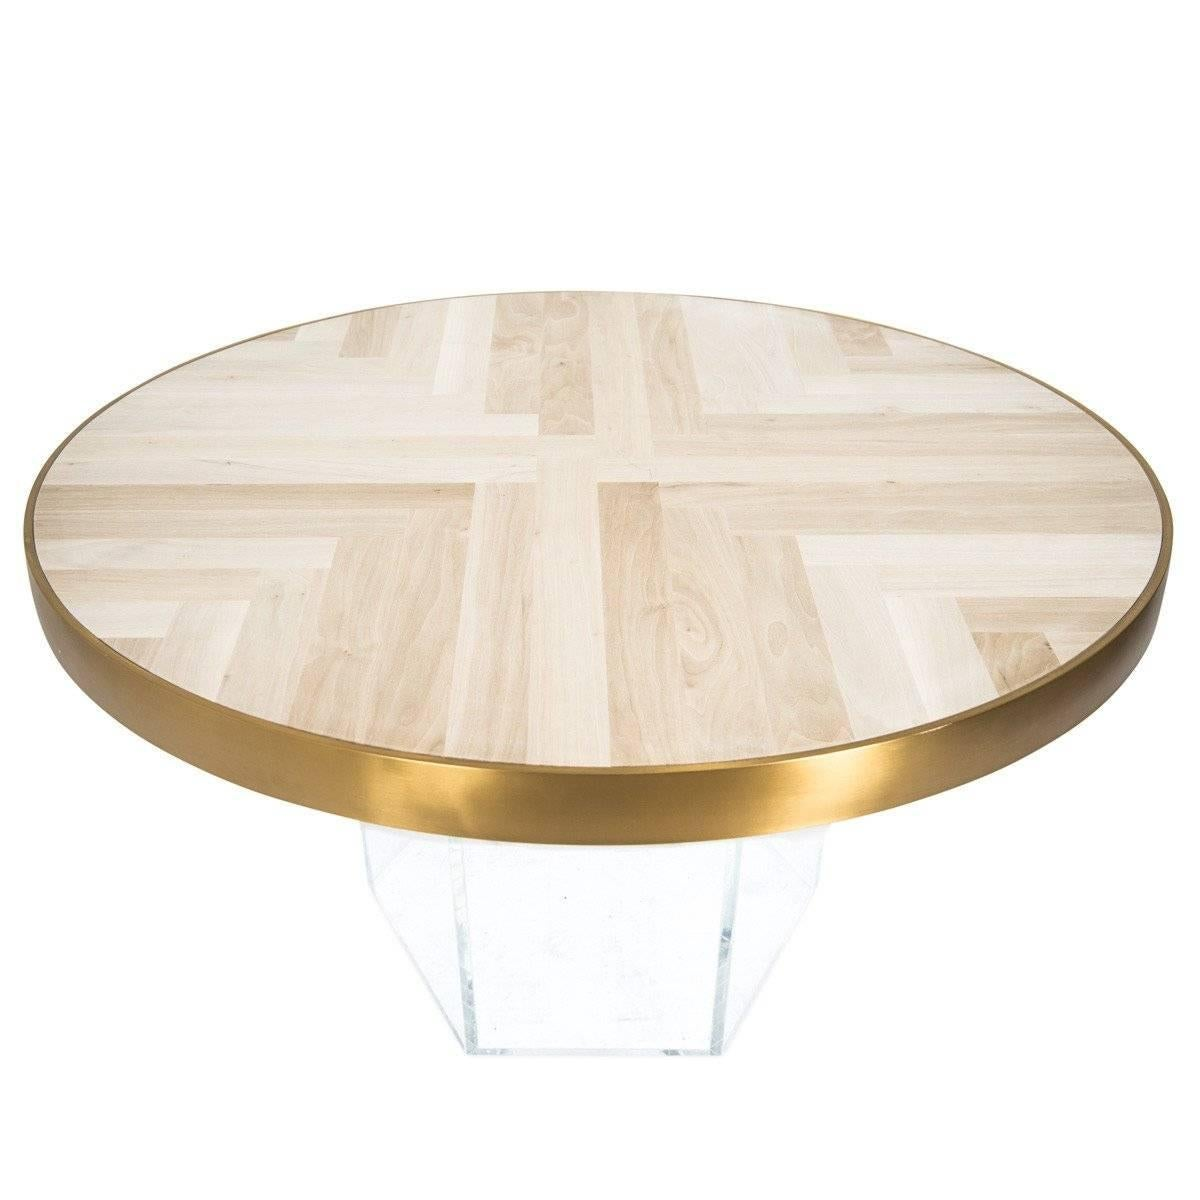 Modern Round Dining Table Herringbone Pattern Bleached Walnut Top Plinth  Base